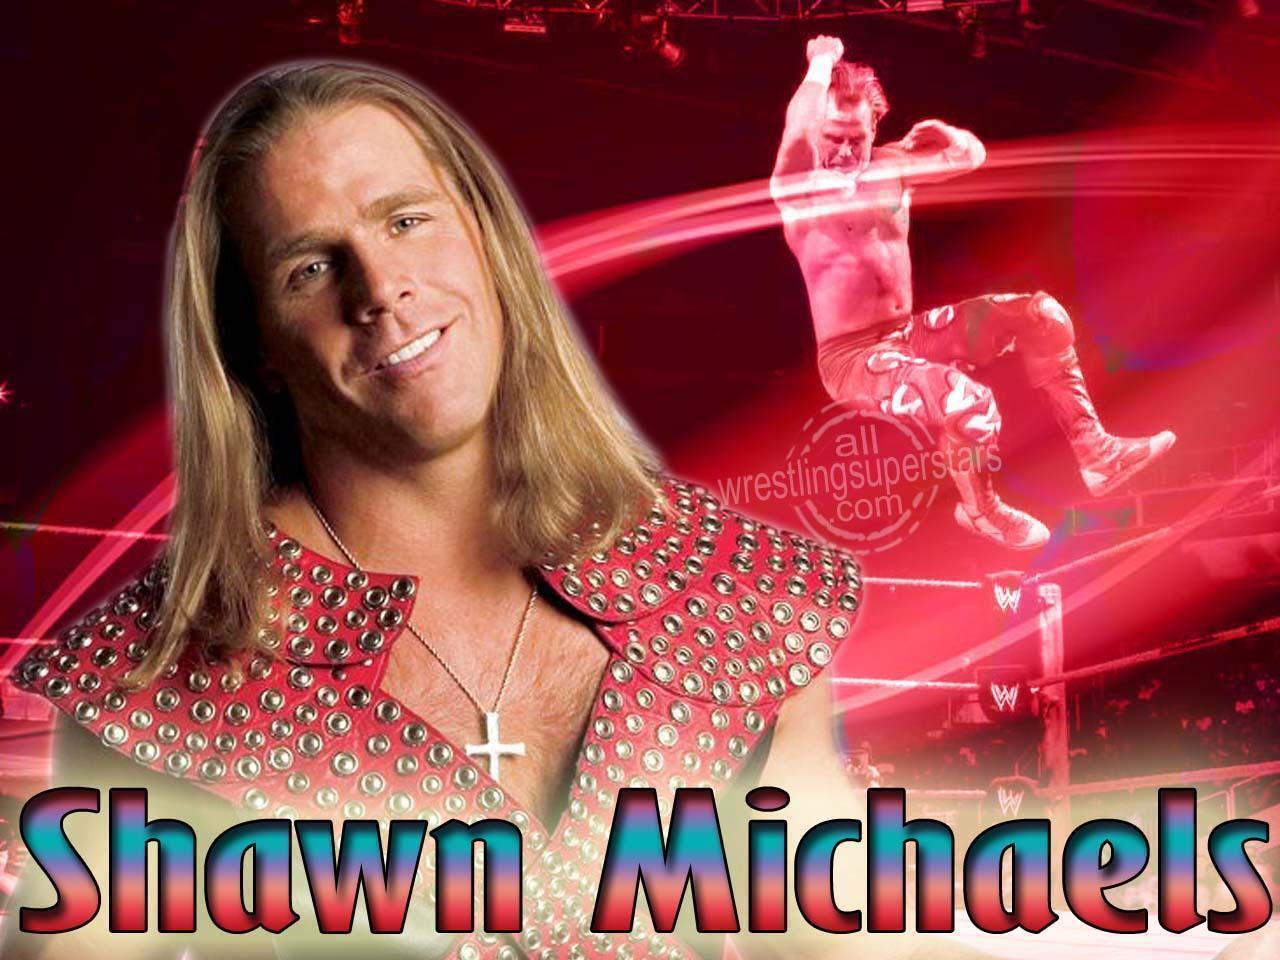 HBK <3 - Shawn Michaels Wallpaper (16256871) - Fanpop